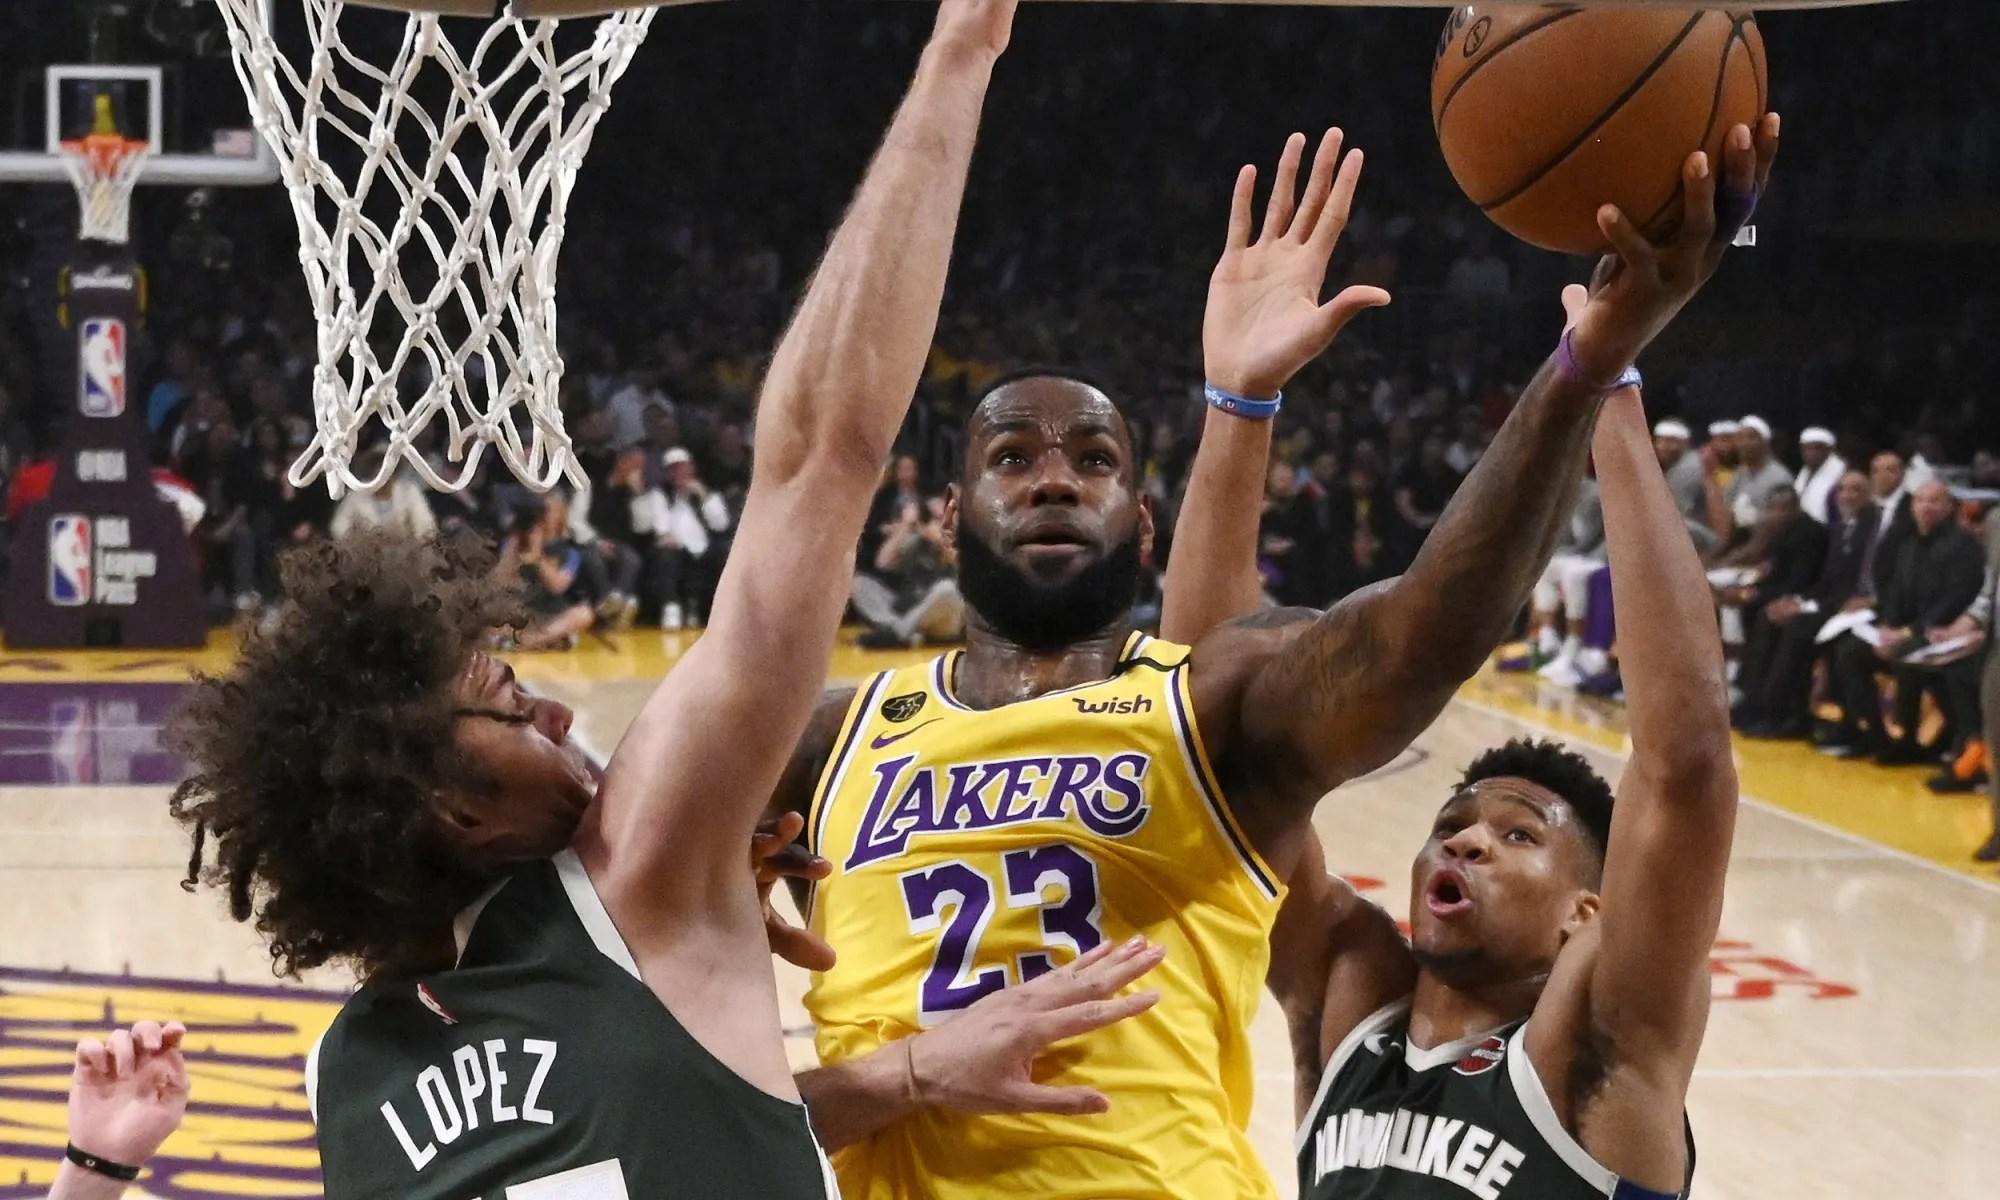 LeBron James, Robin Lopez and forward Giannis Antetokounmpo. Los Angeles Lakers vs Milwaukee Bucks at STAPLES Center